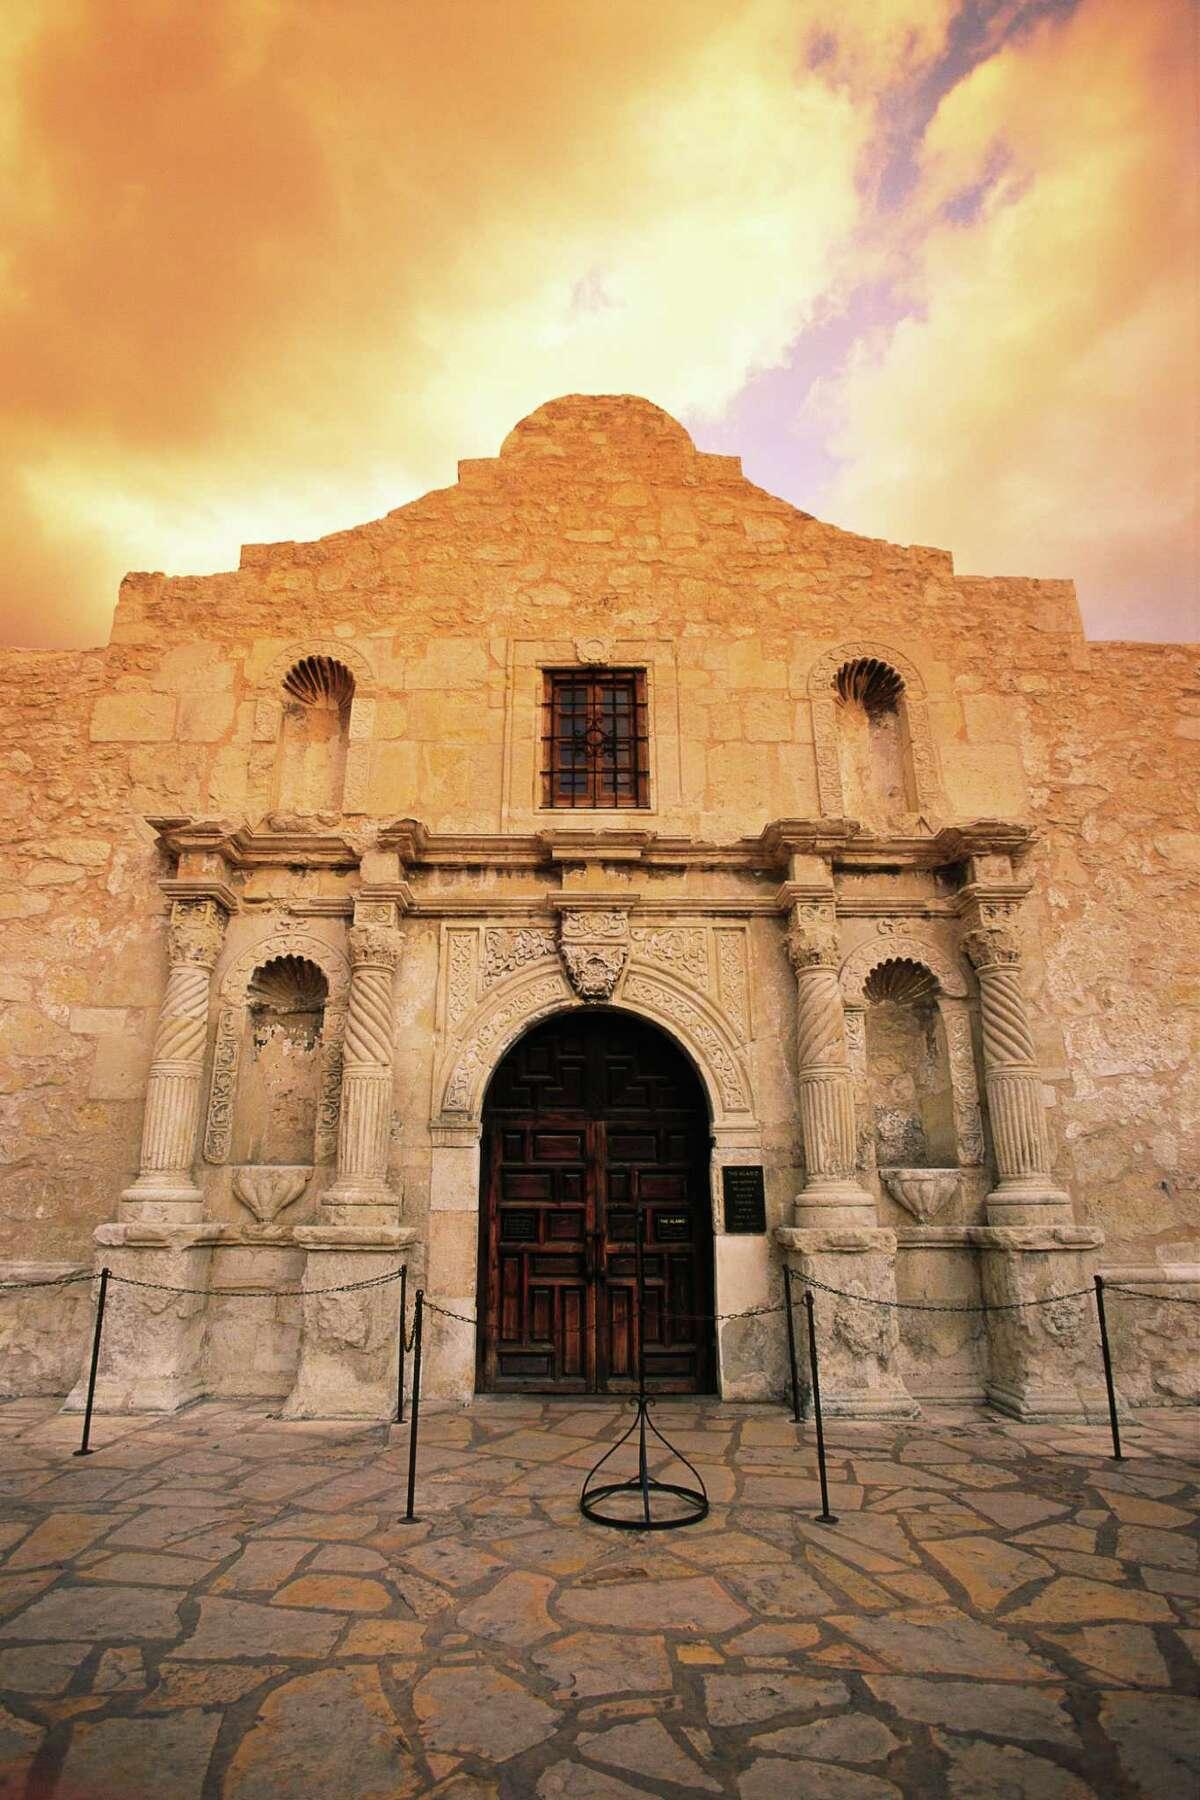 The Alamo San Antonio Convention & Visitors Bureau